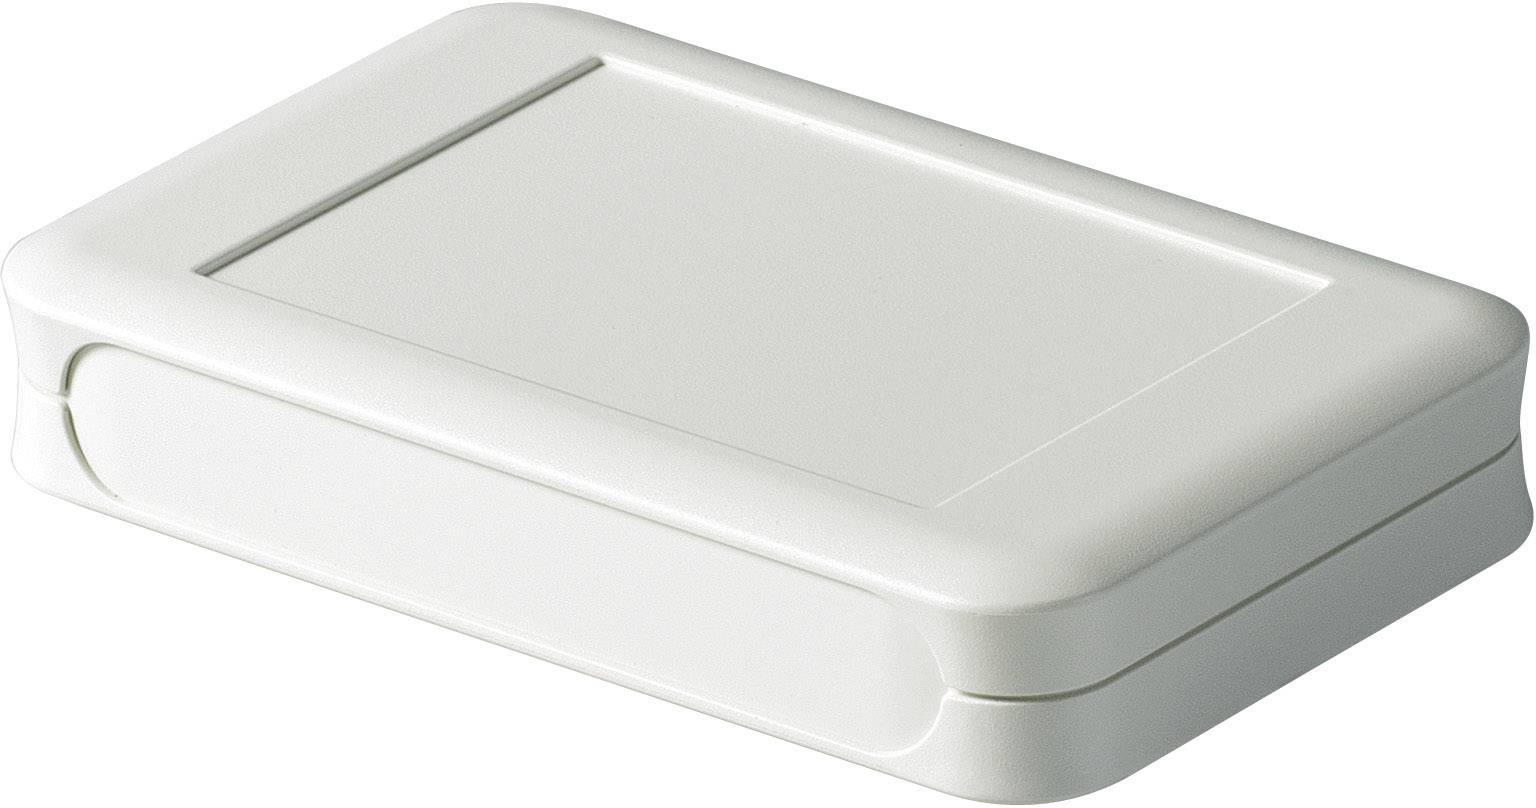 Puzdro na stenu, puzdro na stôl OKW SOFT-CASE D9053107, 92 x 150 x 28 mm, ABS, sivobiela, 1 ks